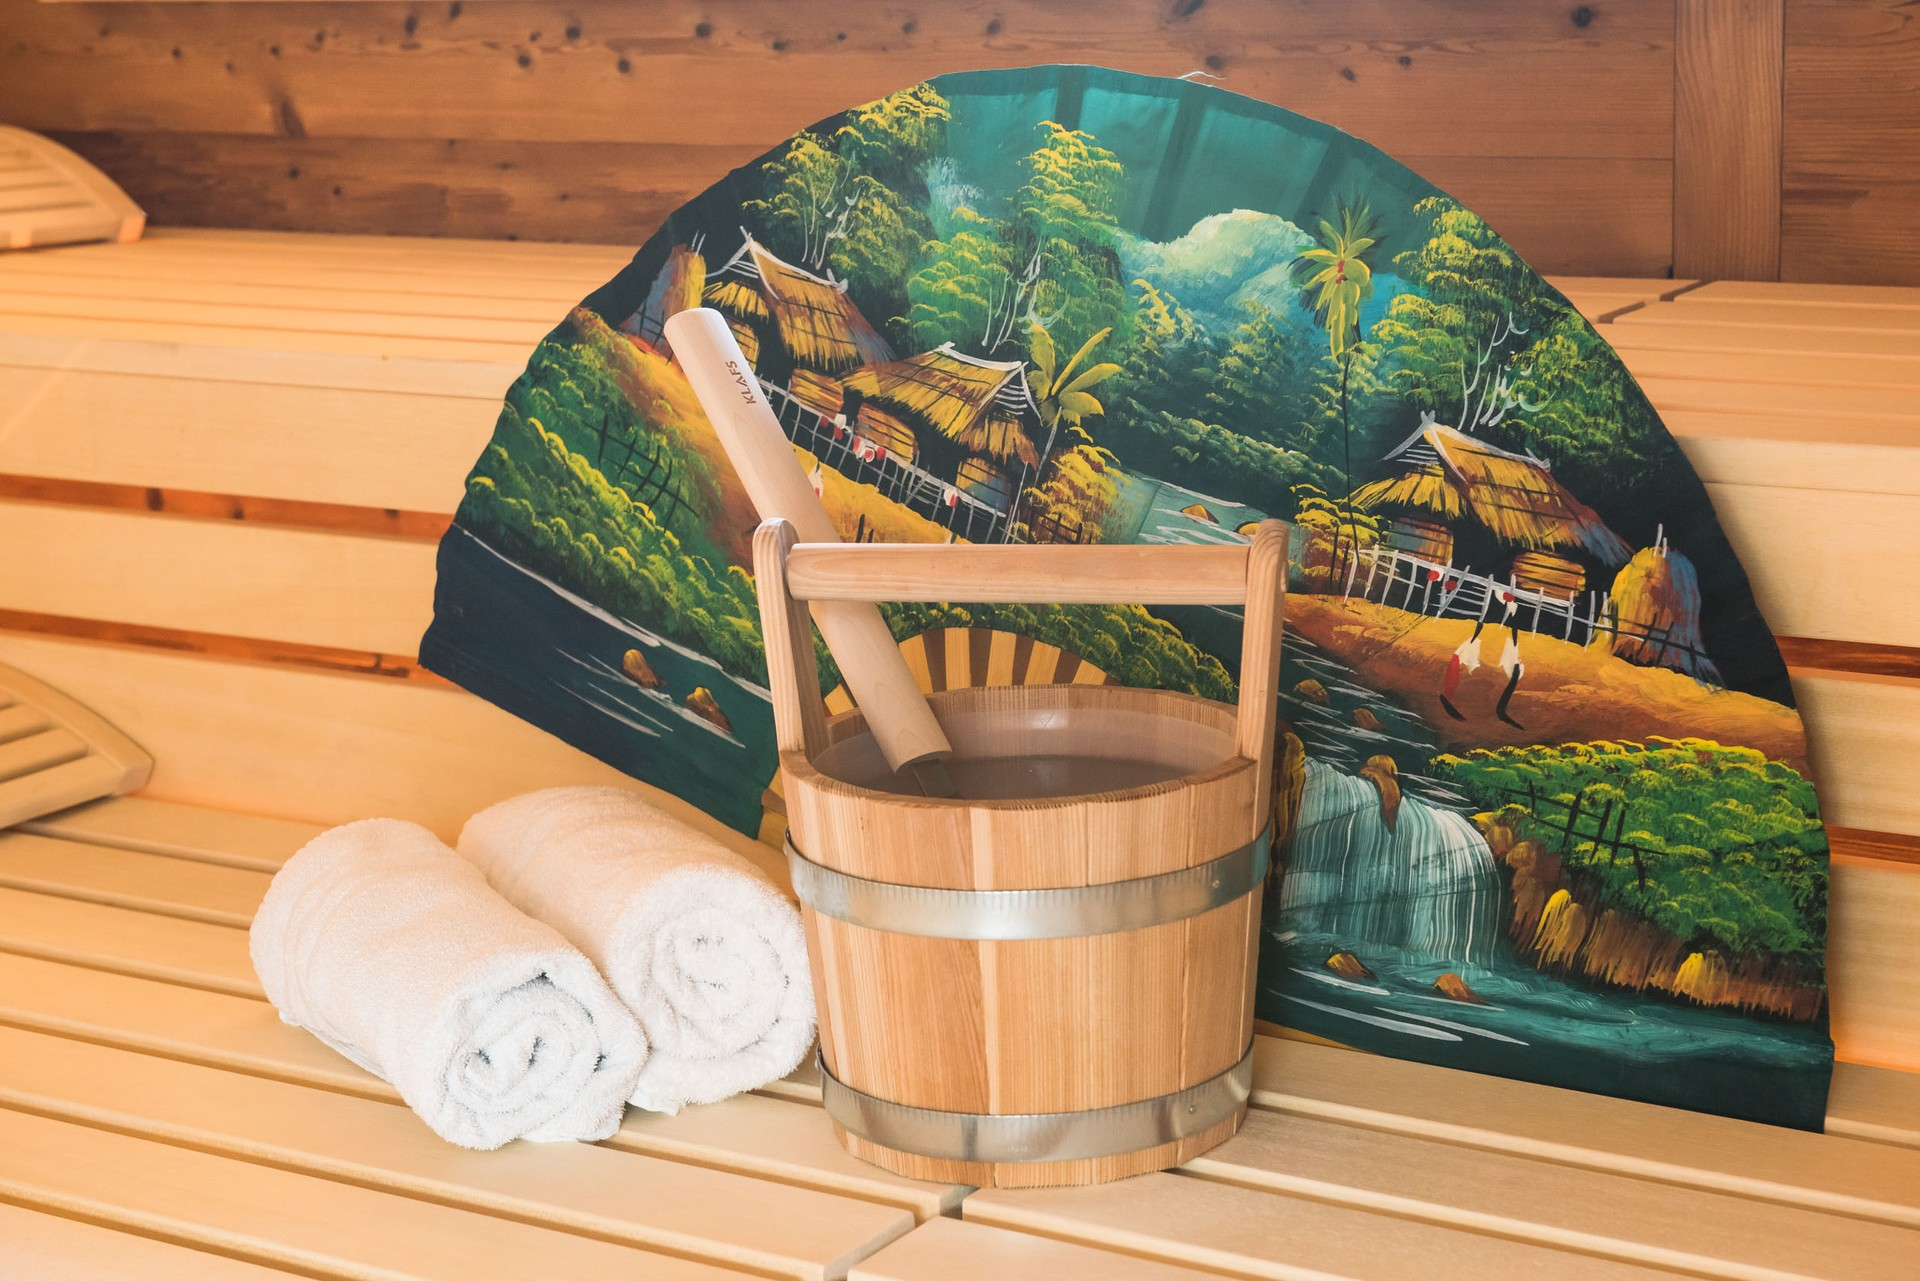 sauna gemeinde mallnitz. Black Bedroom Furniture Sets. Home Design Ideas